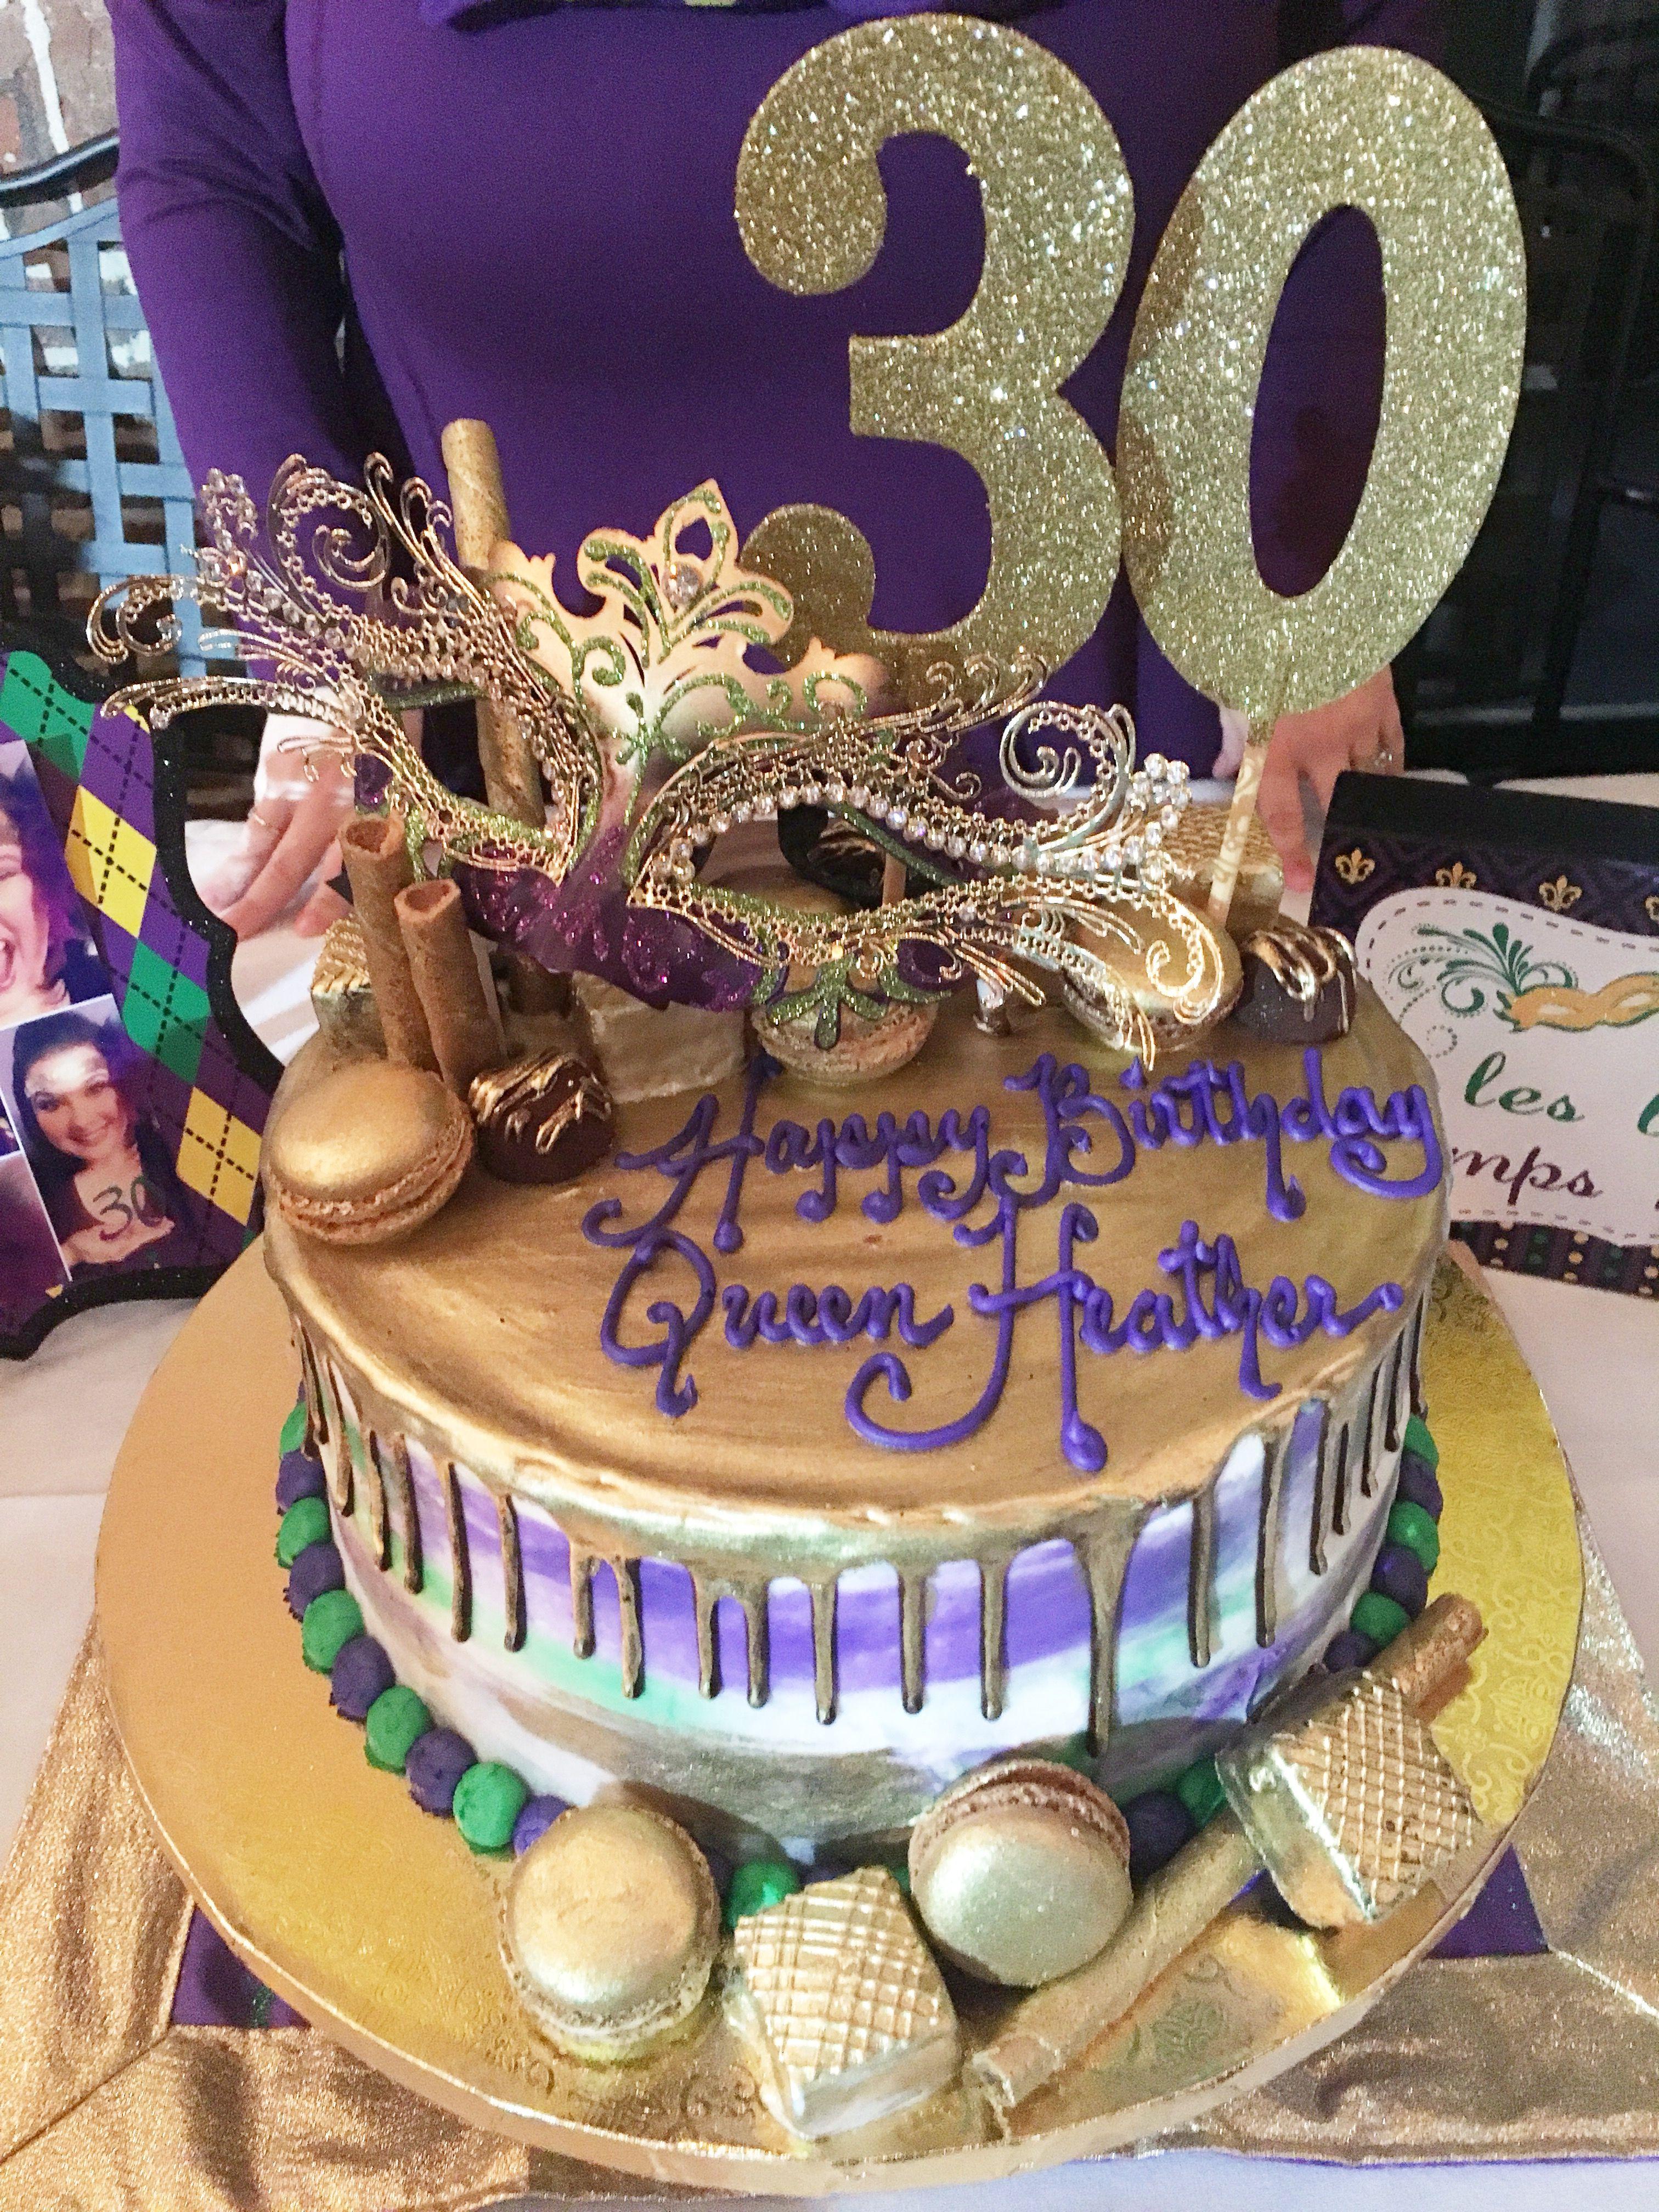 Outstanding Mardi Gras Birthday Cake Mardigras With Images Mardi Gras Funny Birthday Cards Online Alyptdamsfinfo